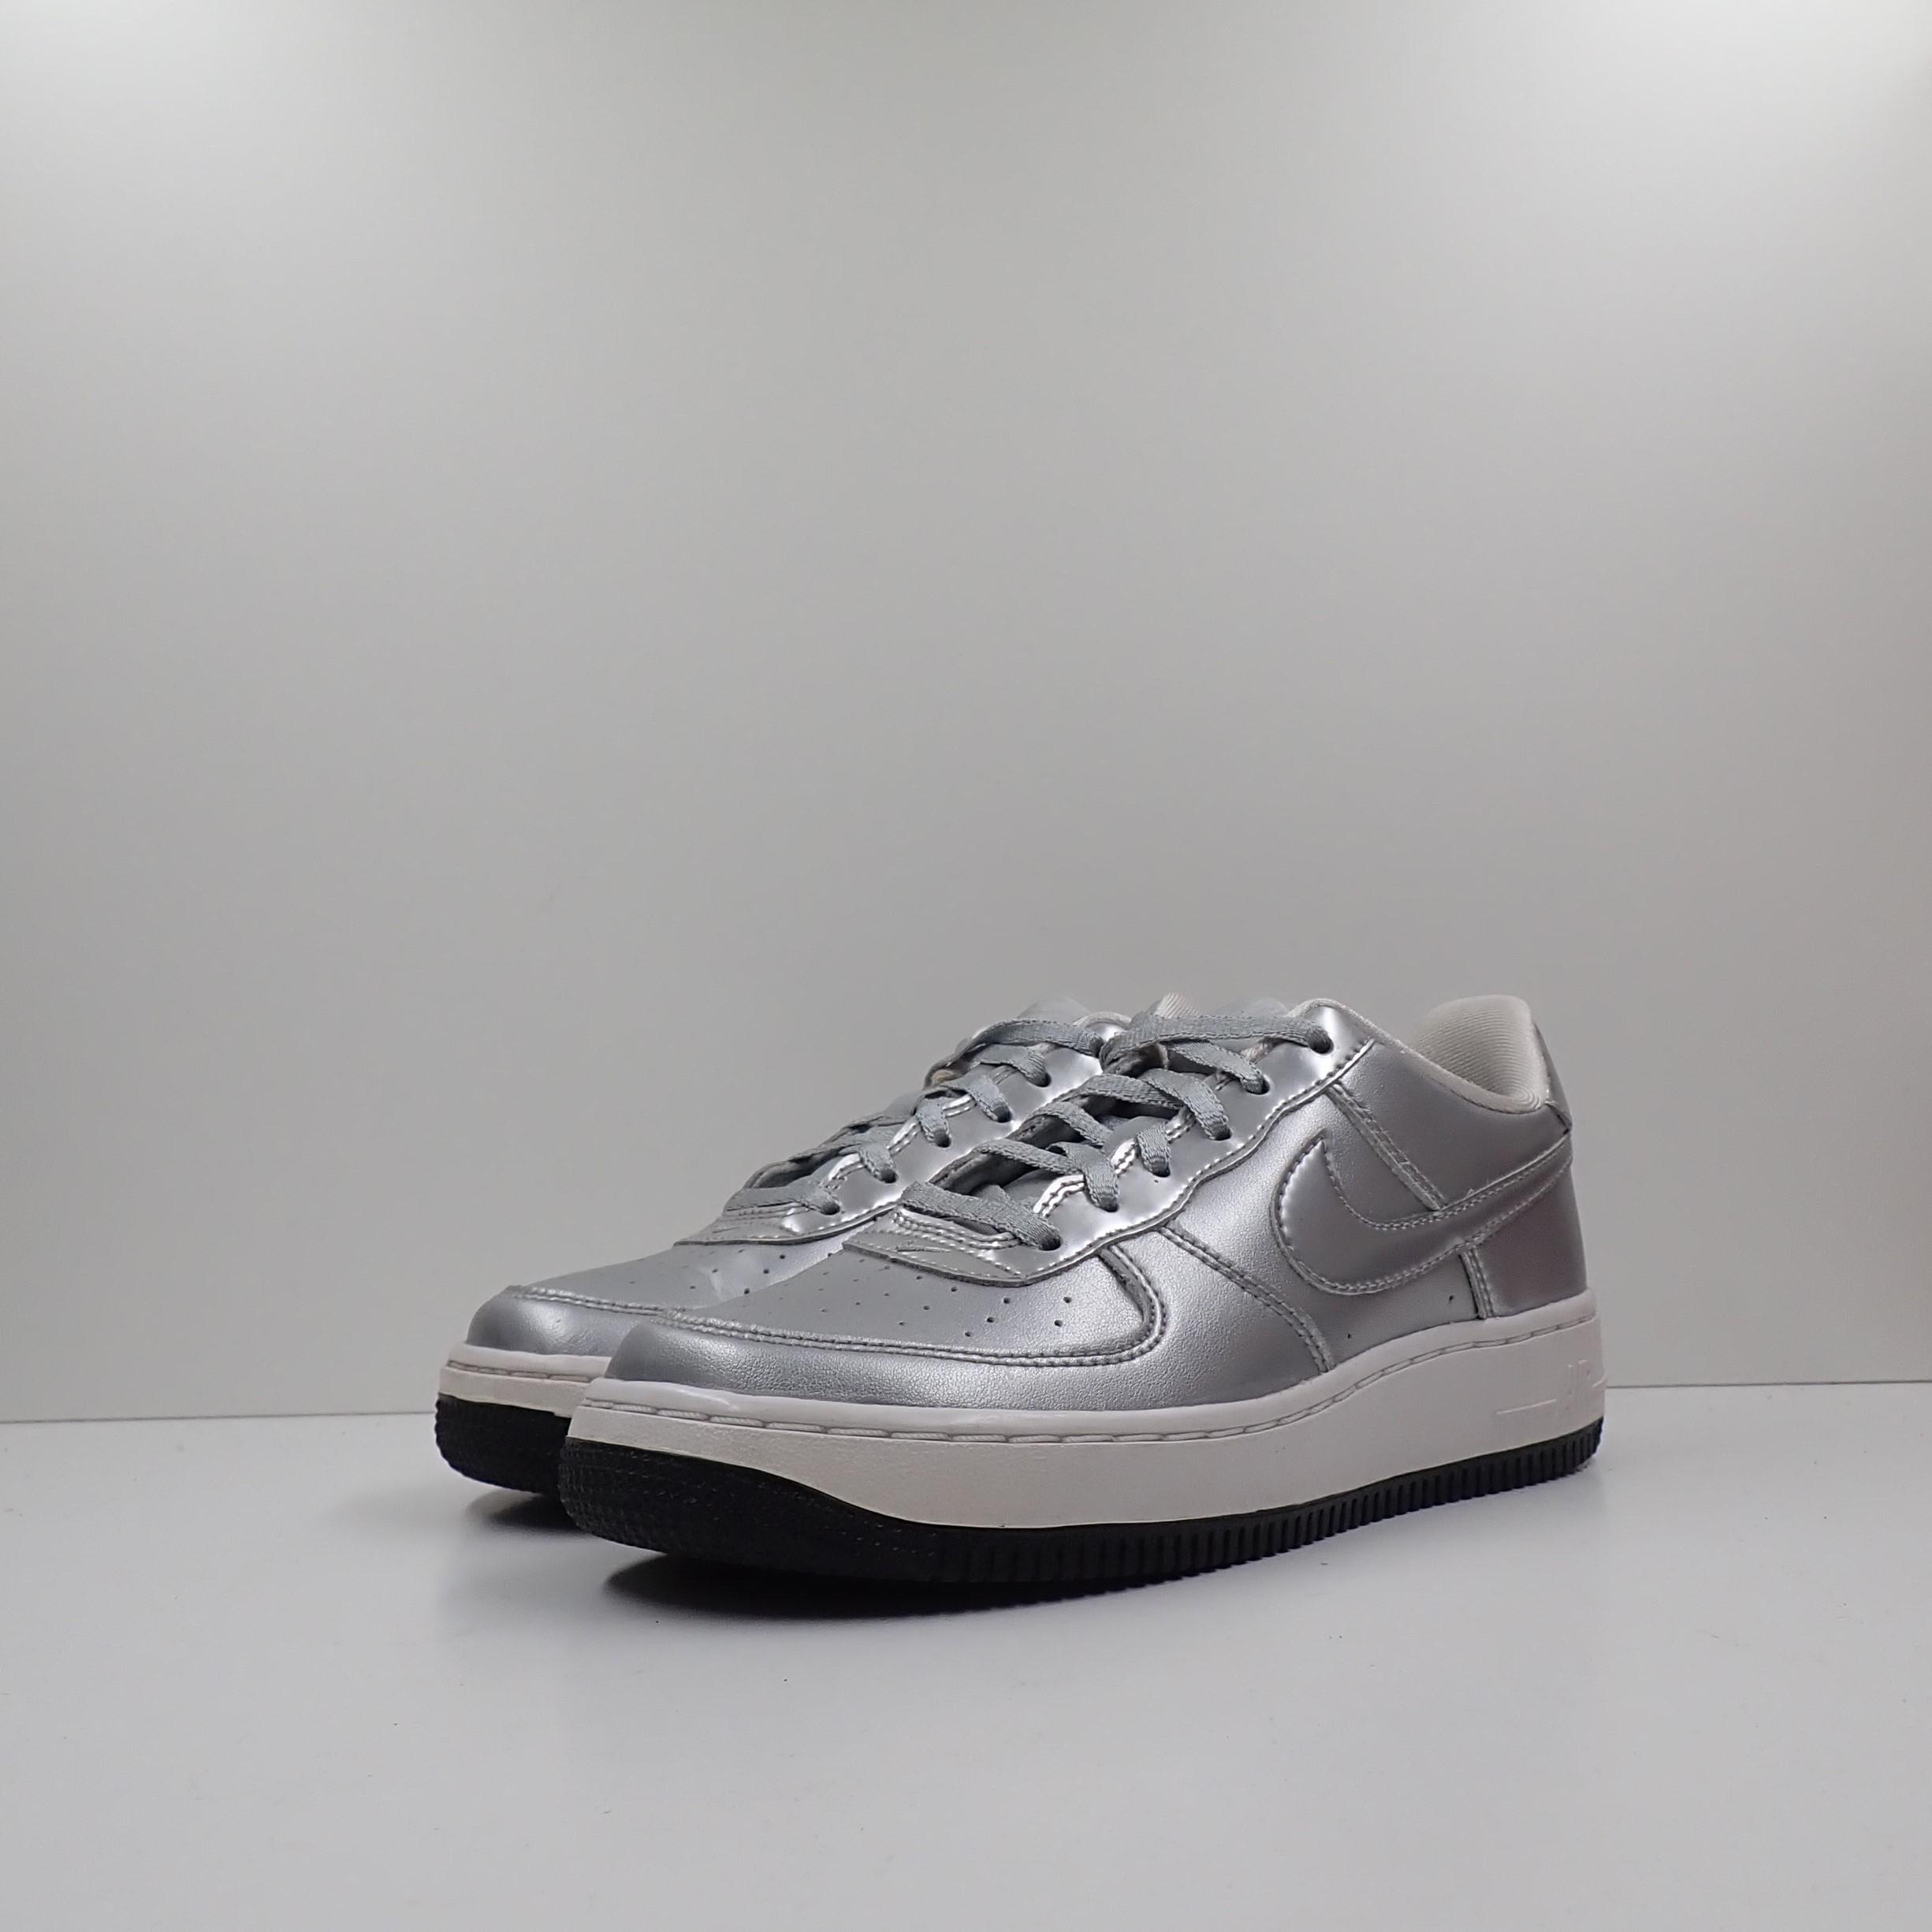 Nike Air Force 1 SE GS Metallic Silver